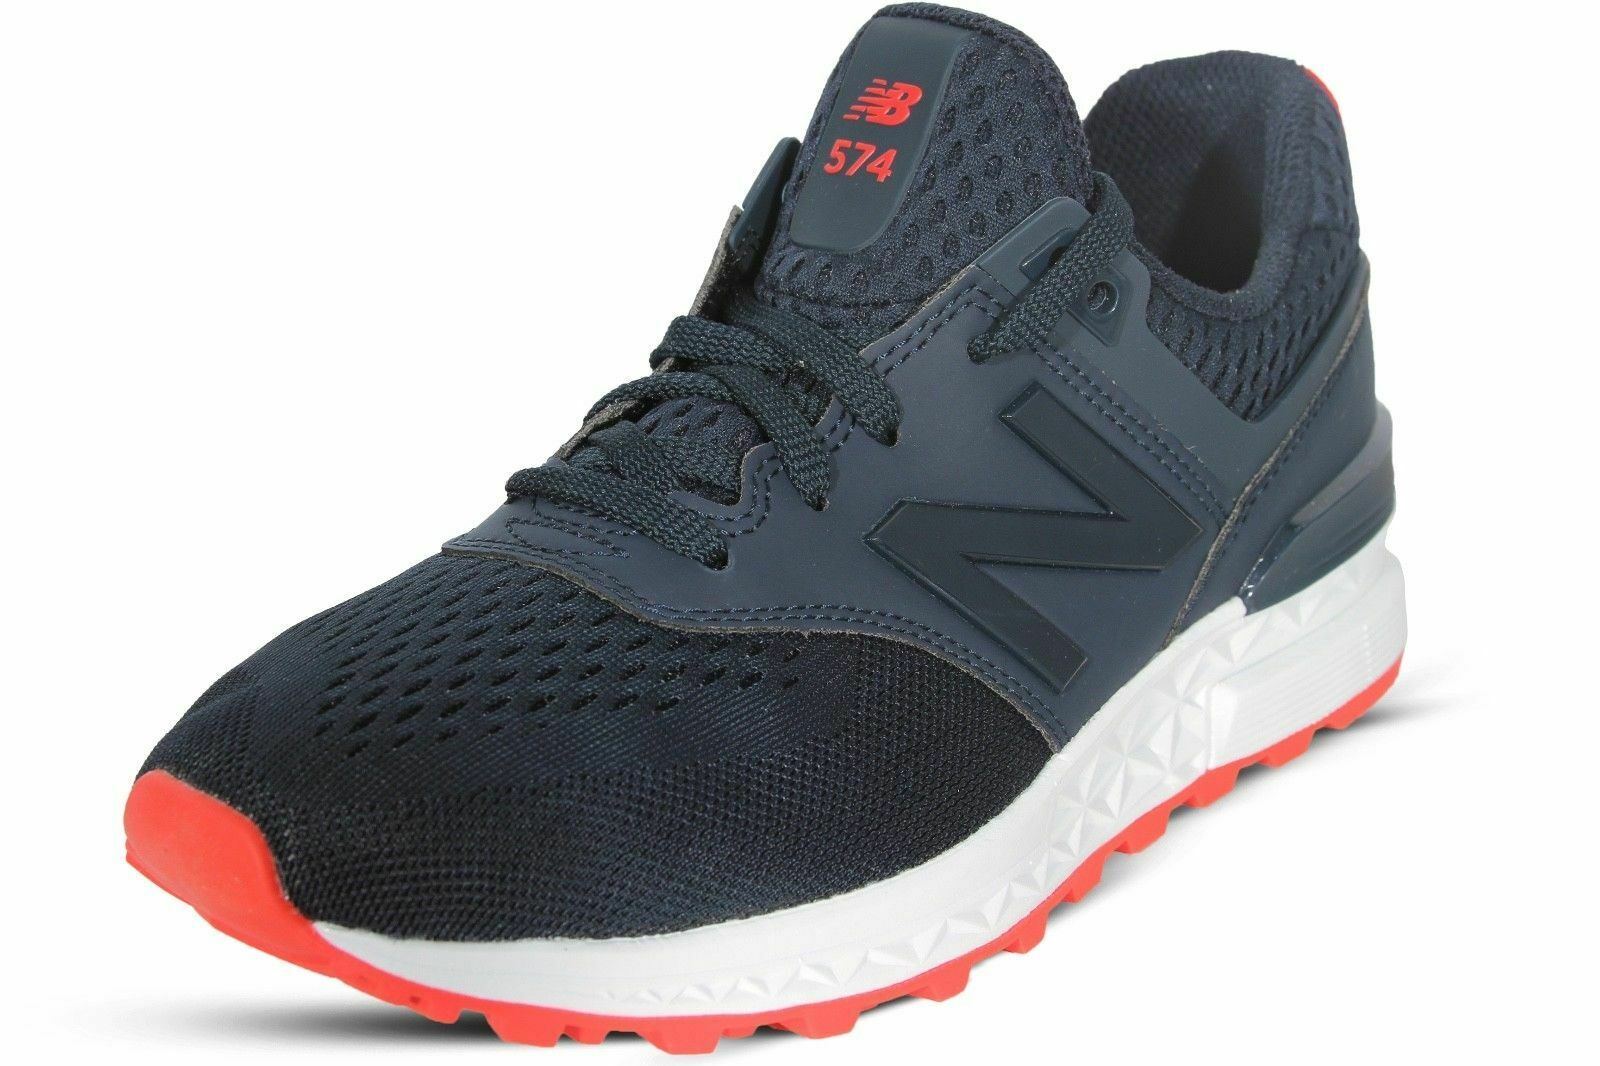 Zapatos New Balance de mujer azul rojo 574 deporte clásico tenis de correr WS574EMA